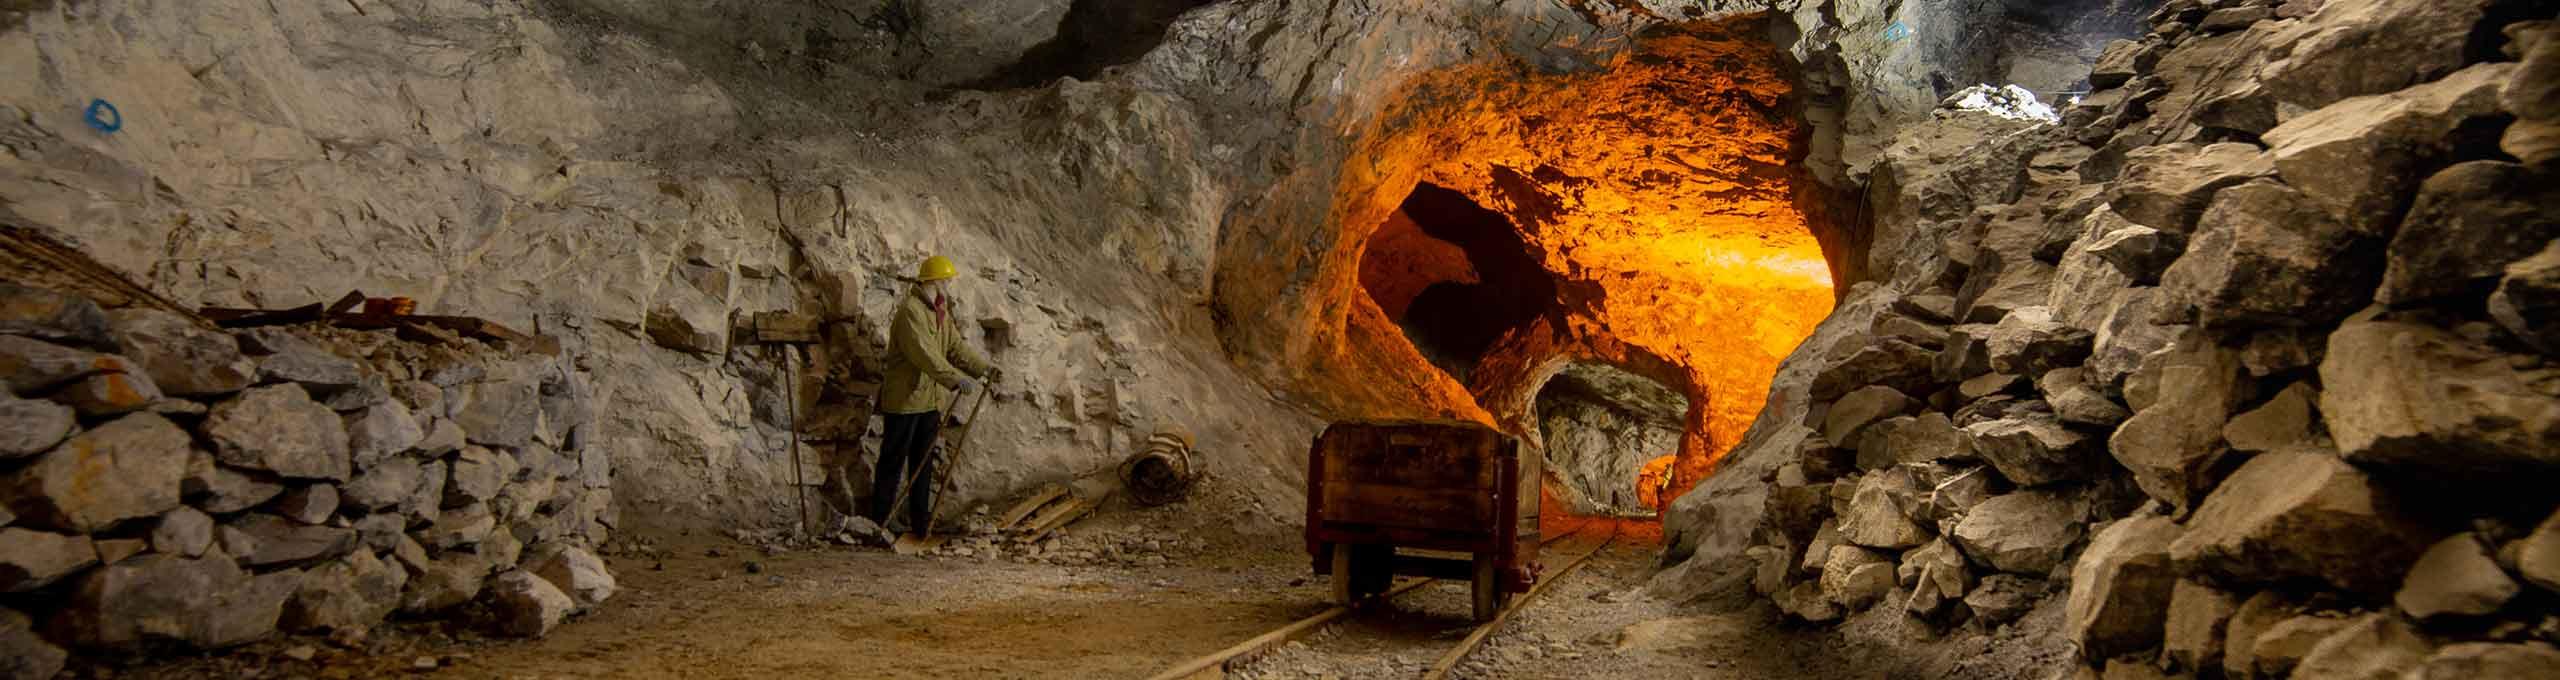 Dossena, Val Brembana, vecchie miniere